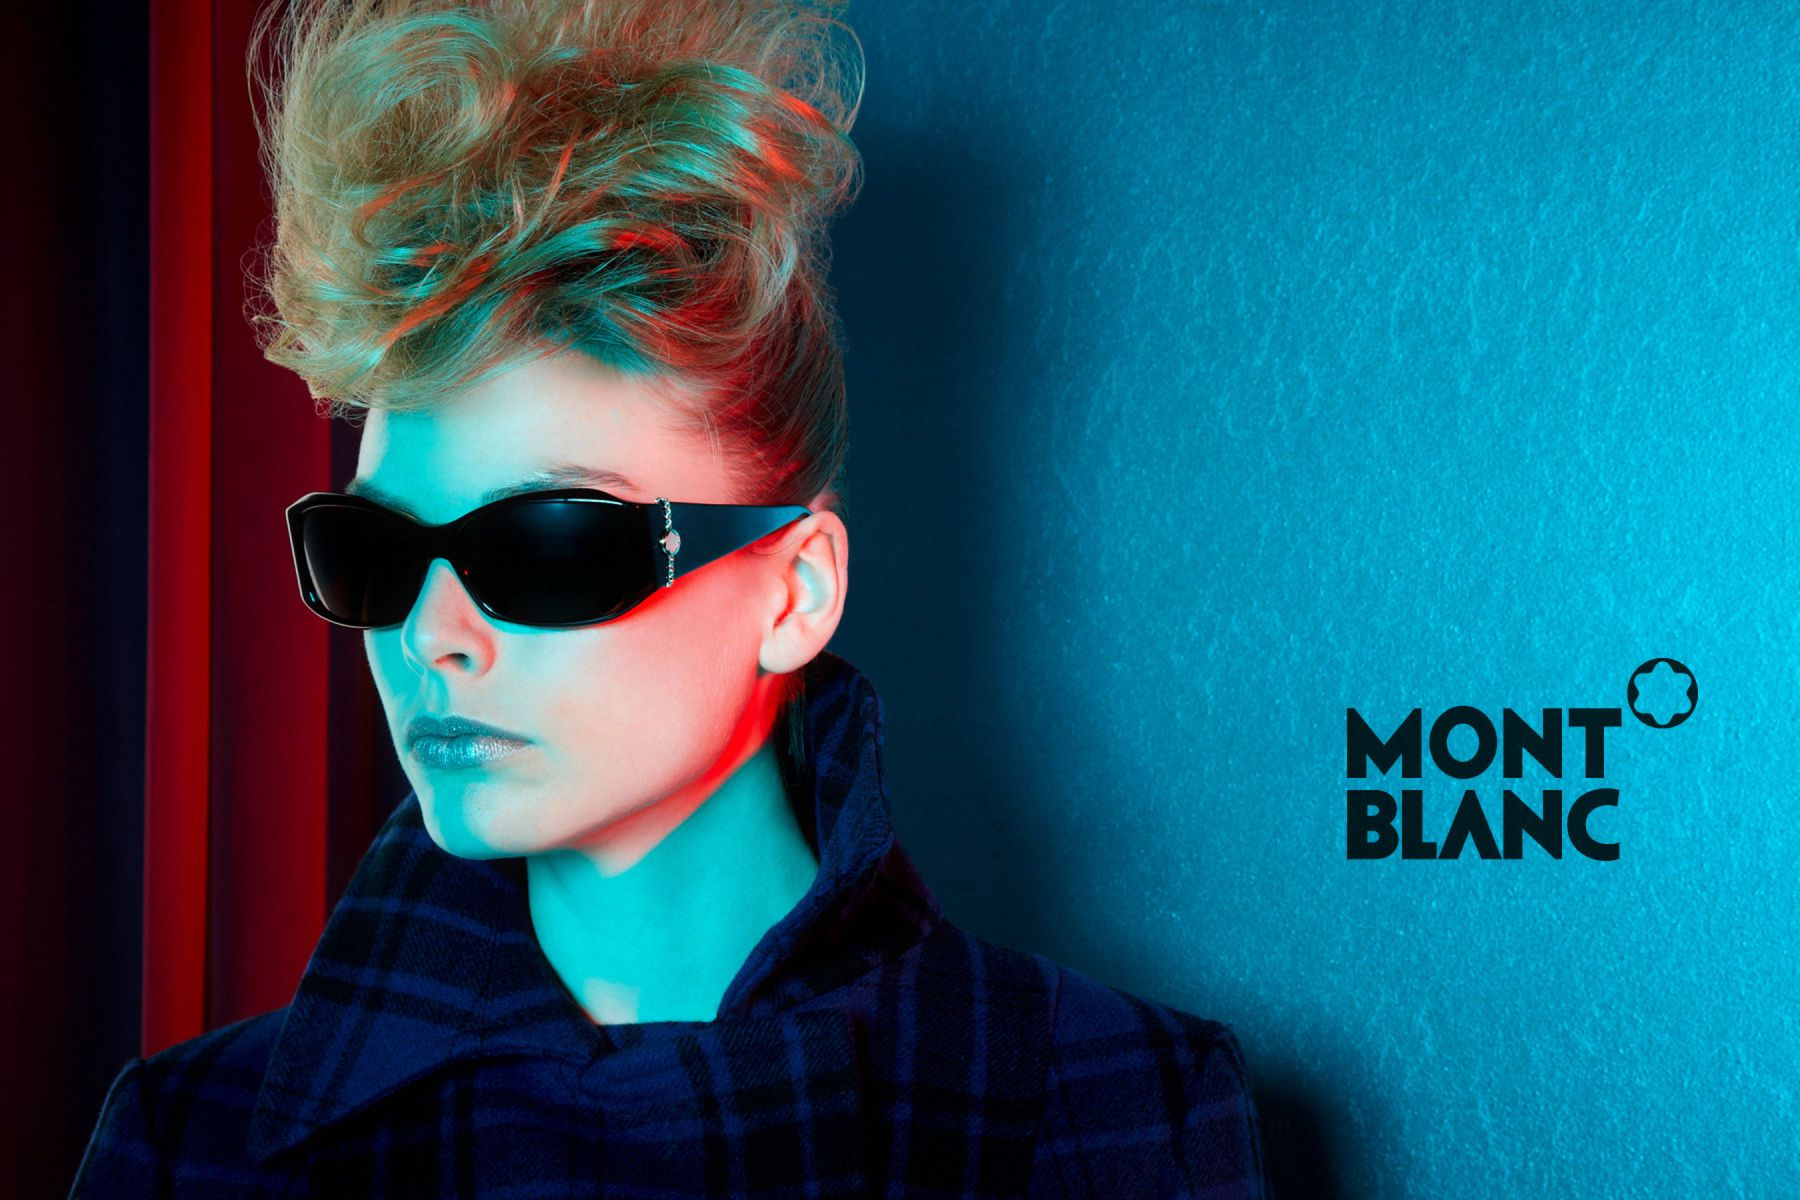 1r10009810_montblanc_sunglasses_001_copy_6_edit.jpg